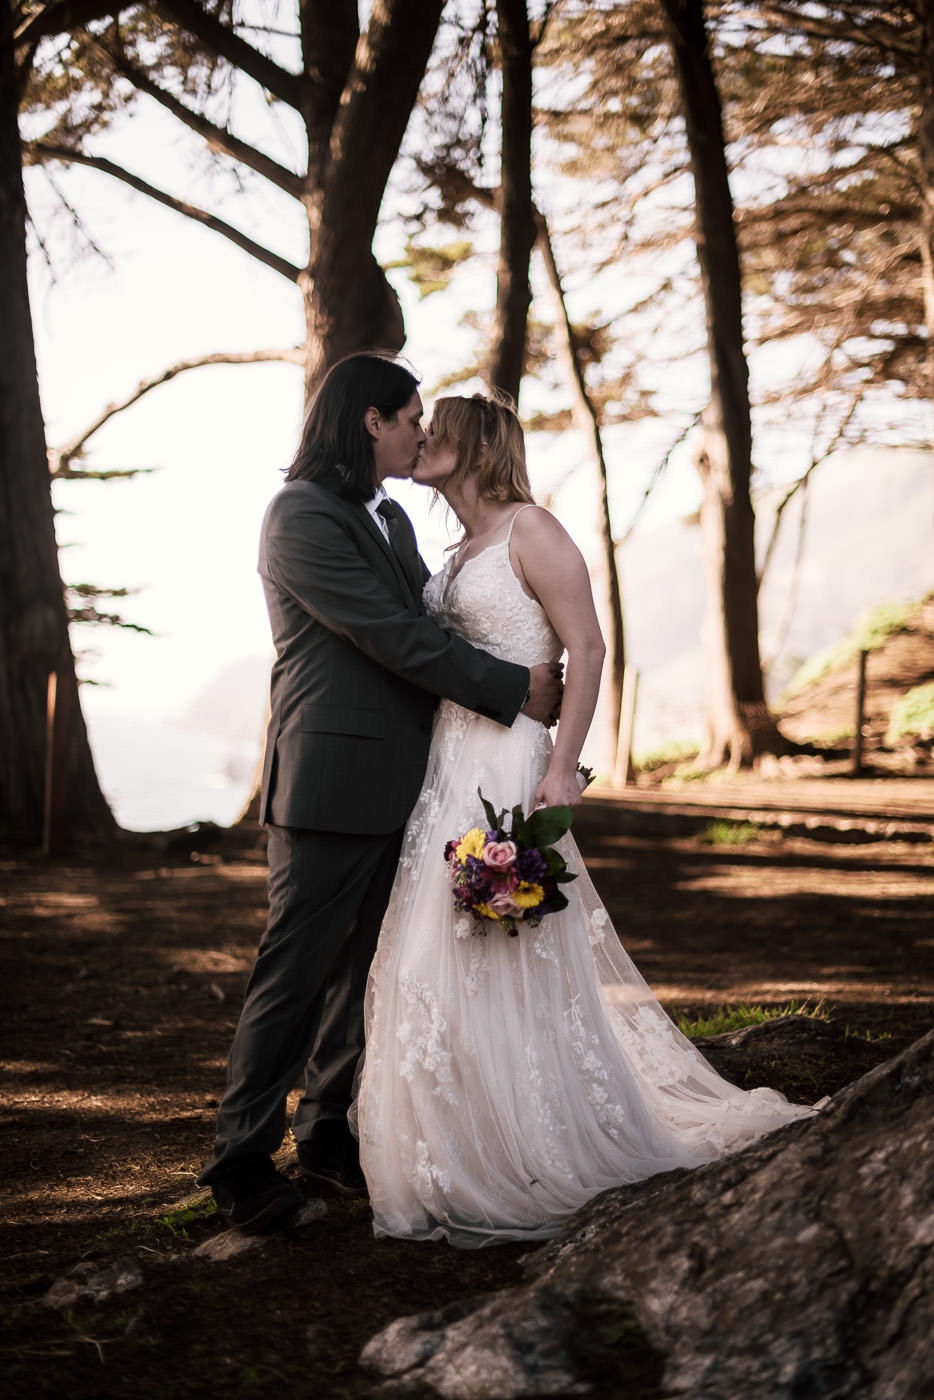 Kiss beneath the pines on the coast of California.